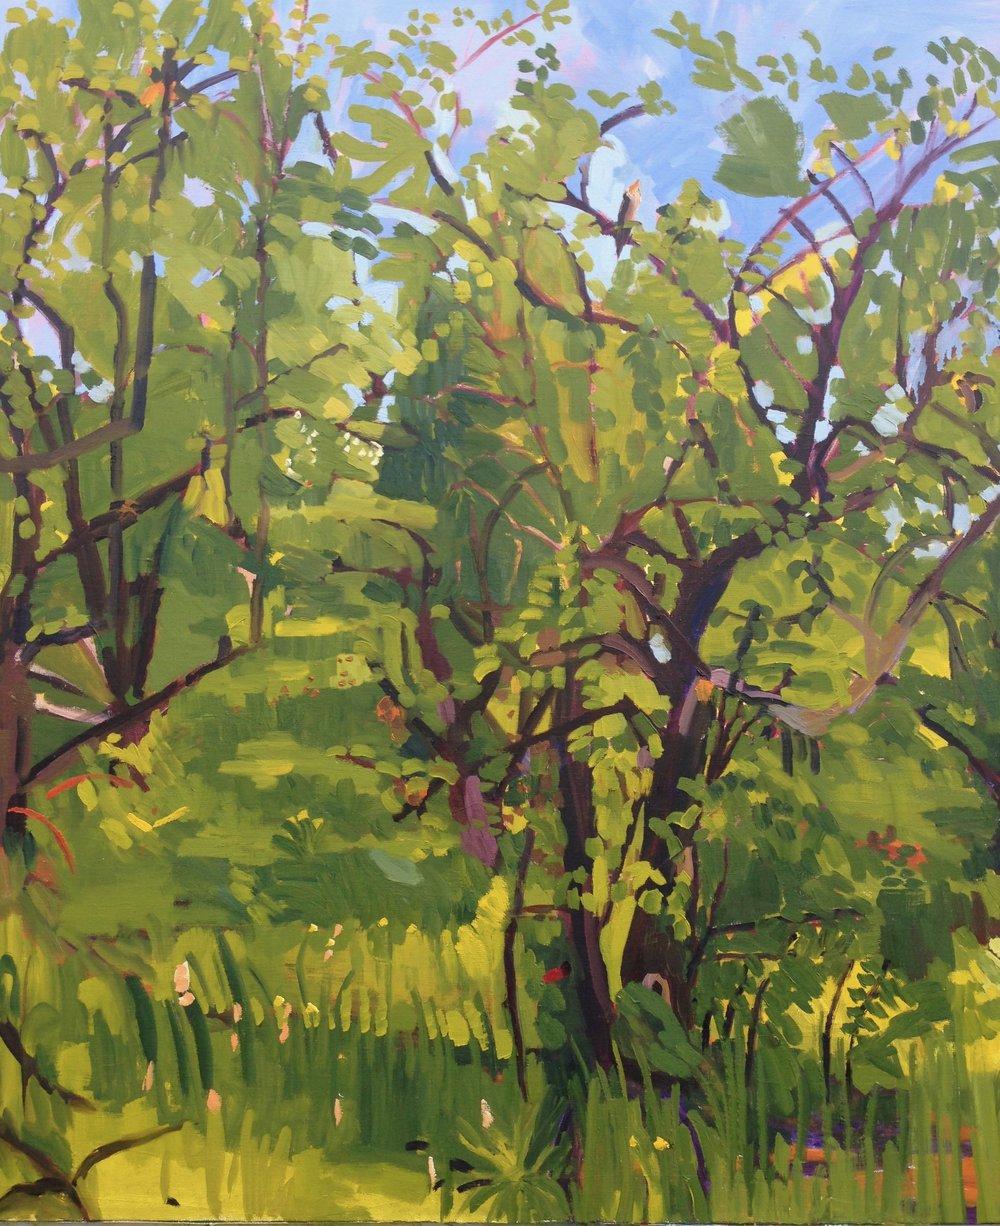 Orchard 3